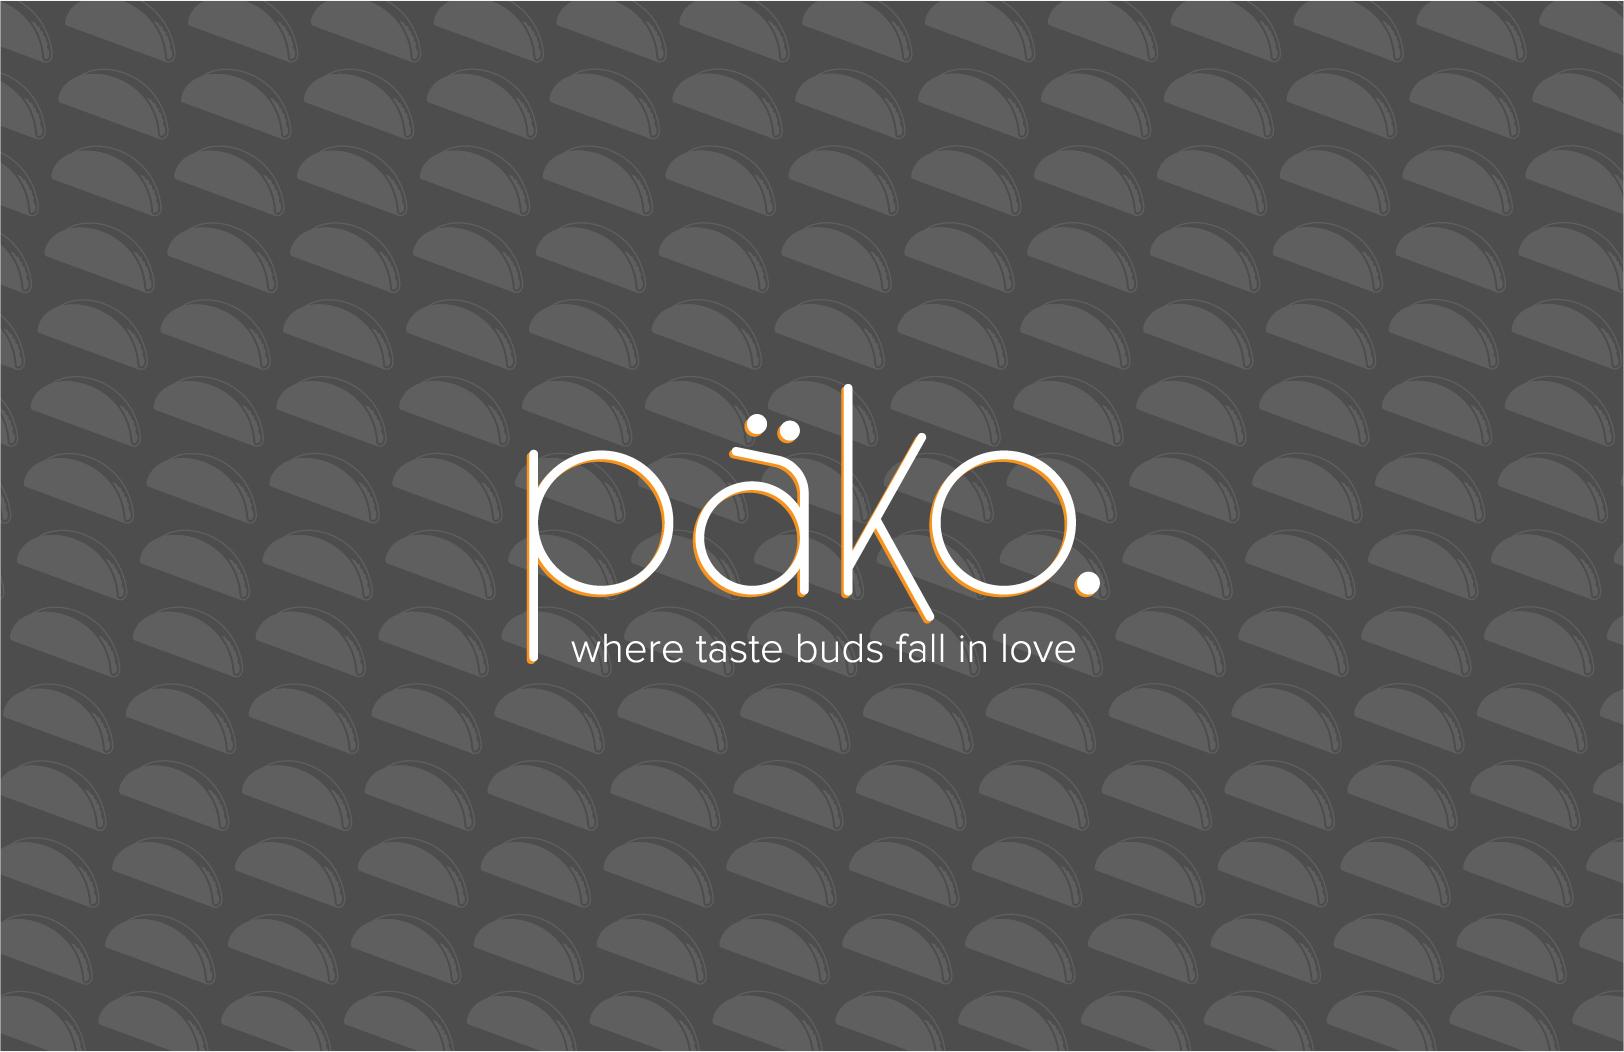 Pako-00.jpg